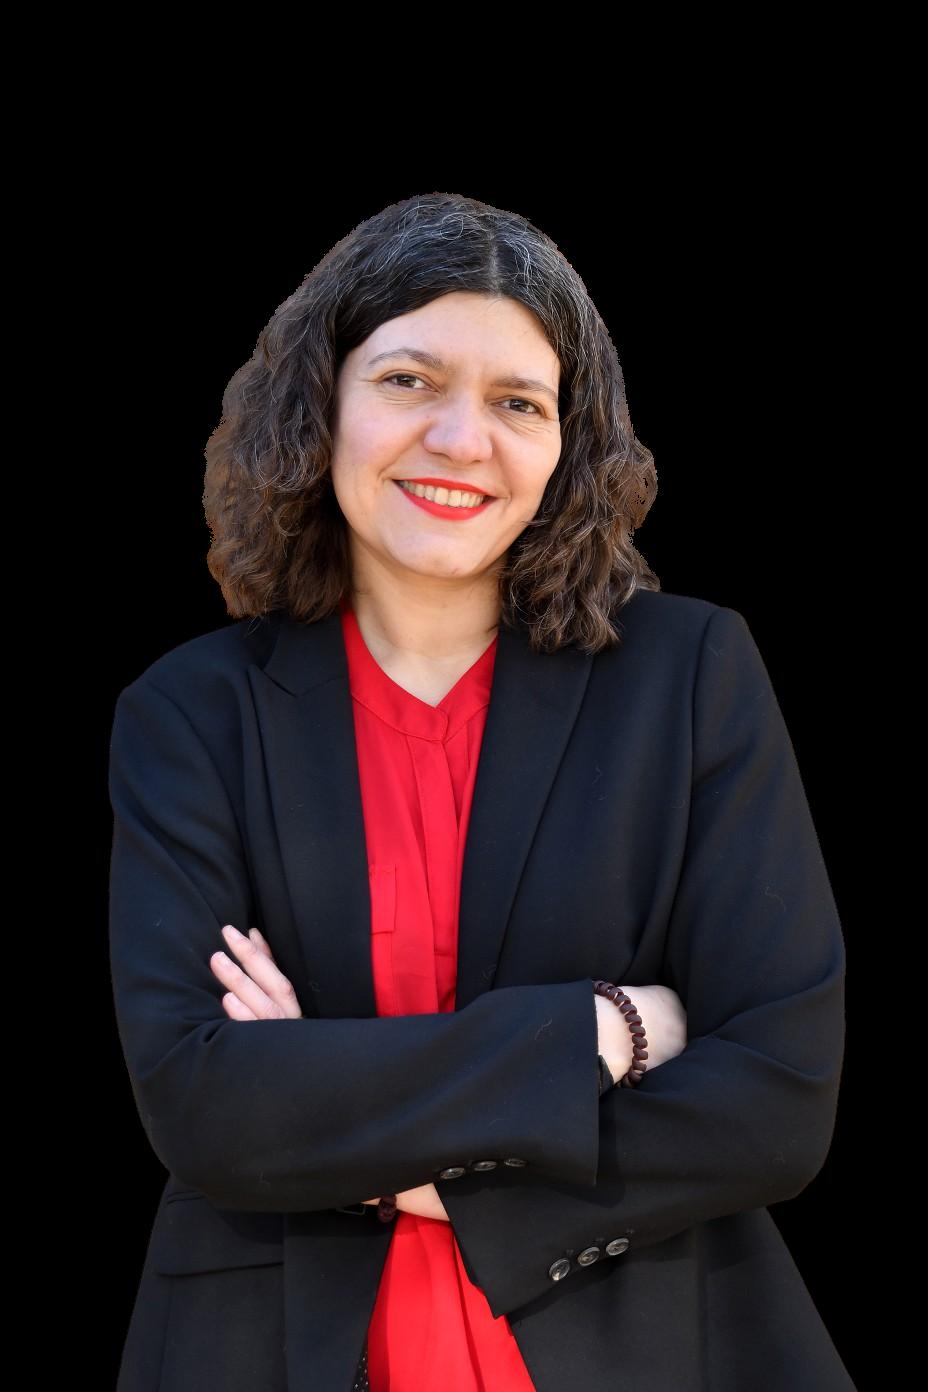 Marisa Alonso Núñez